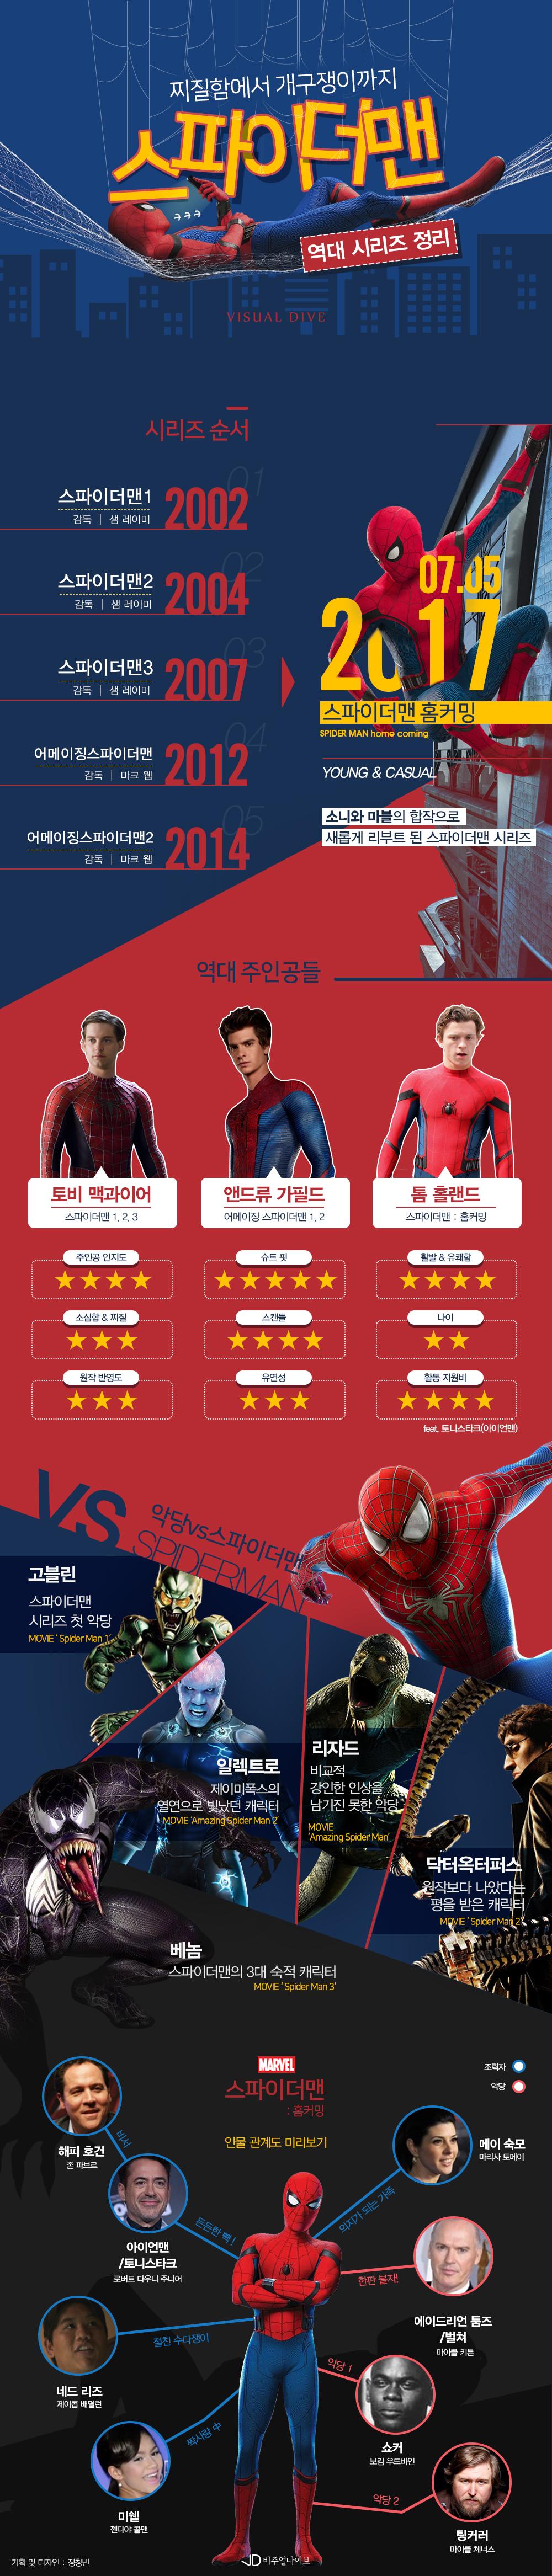 spiderMan_heros_preview